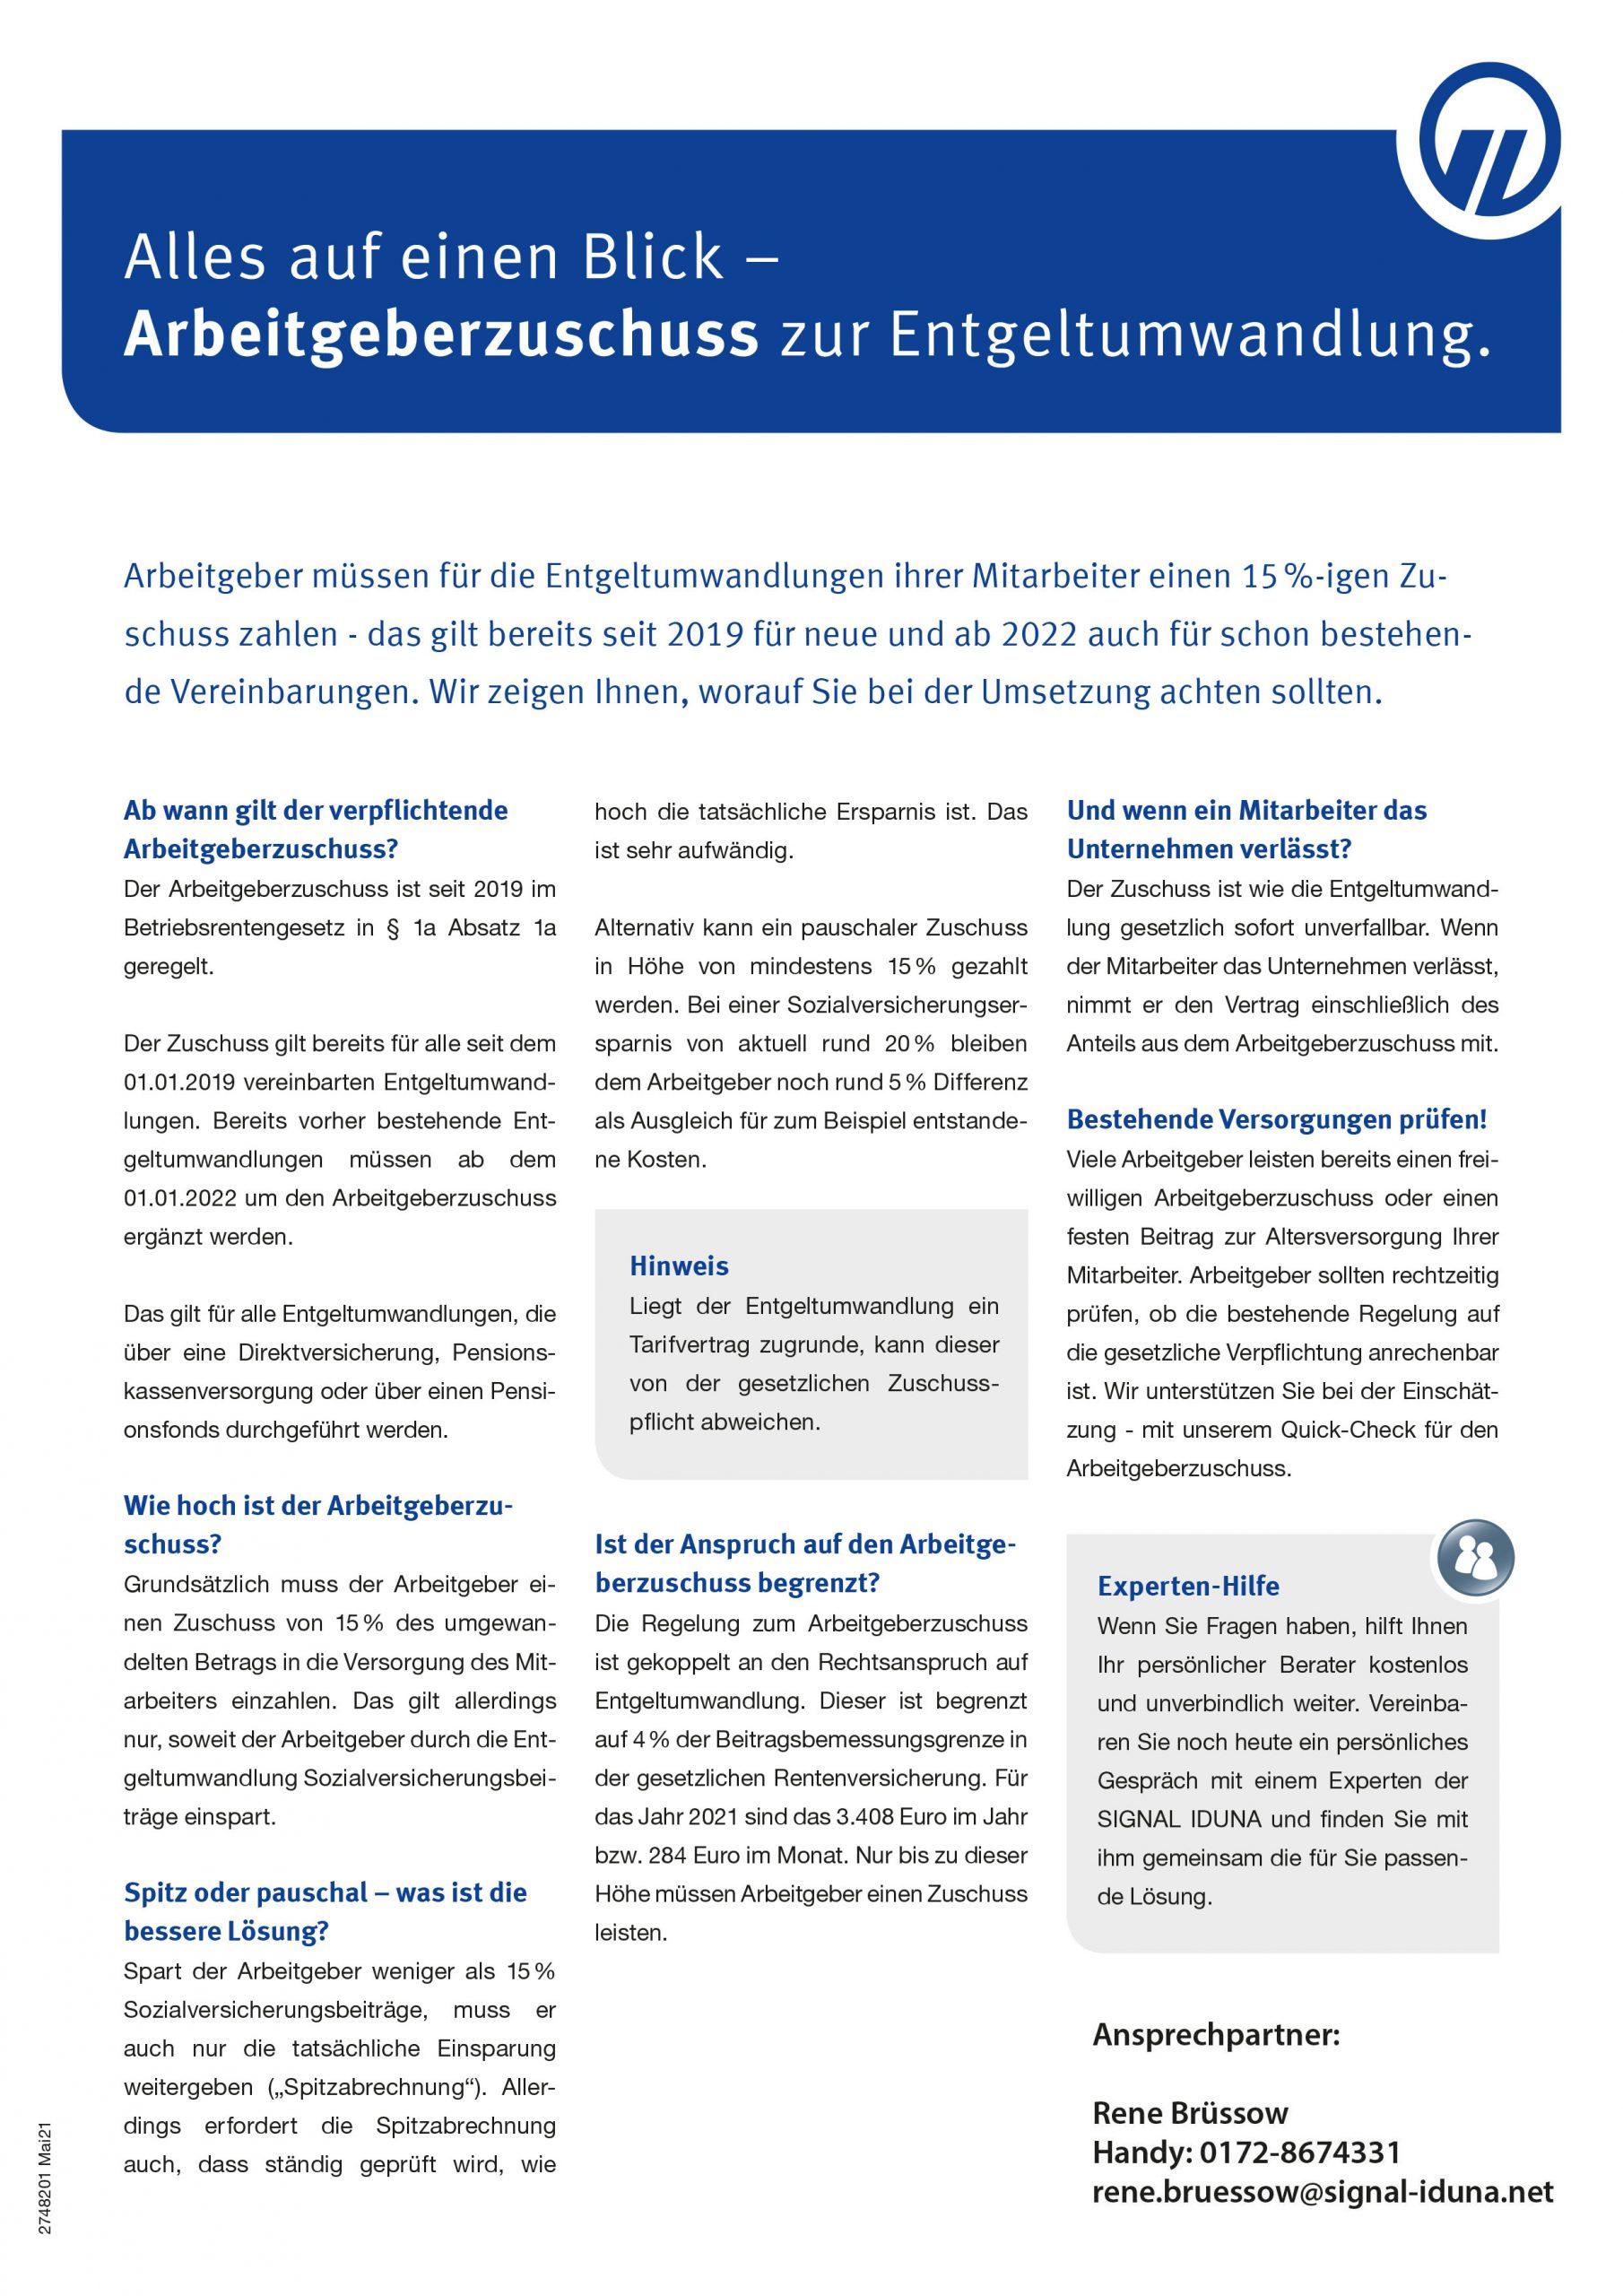 https://dlz-handwerk.de/wp-content/uploads/2021/09/Arbeitgeberzuschuss-scaled.jpg